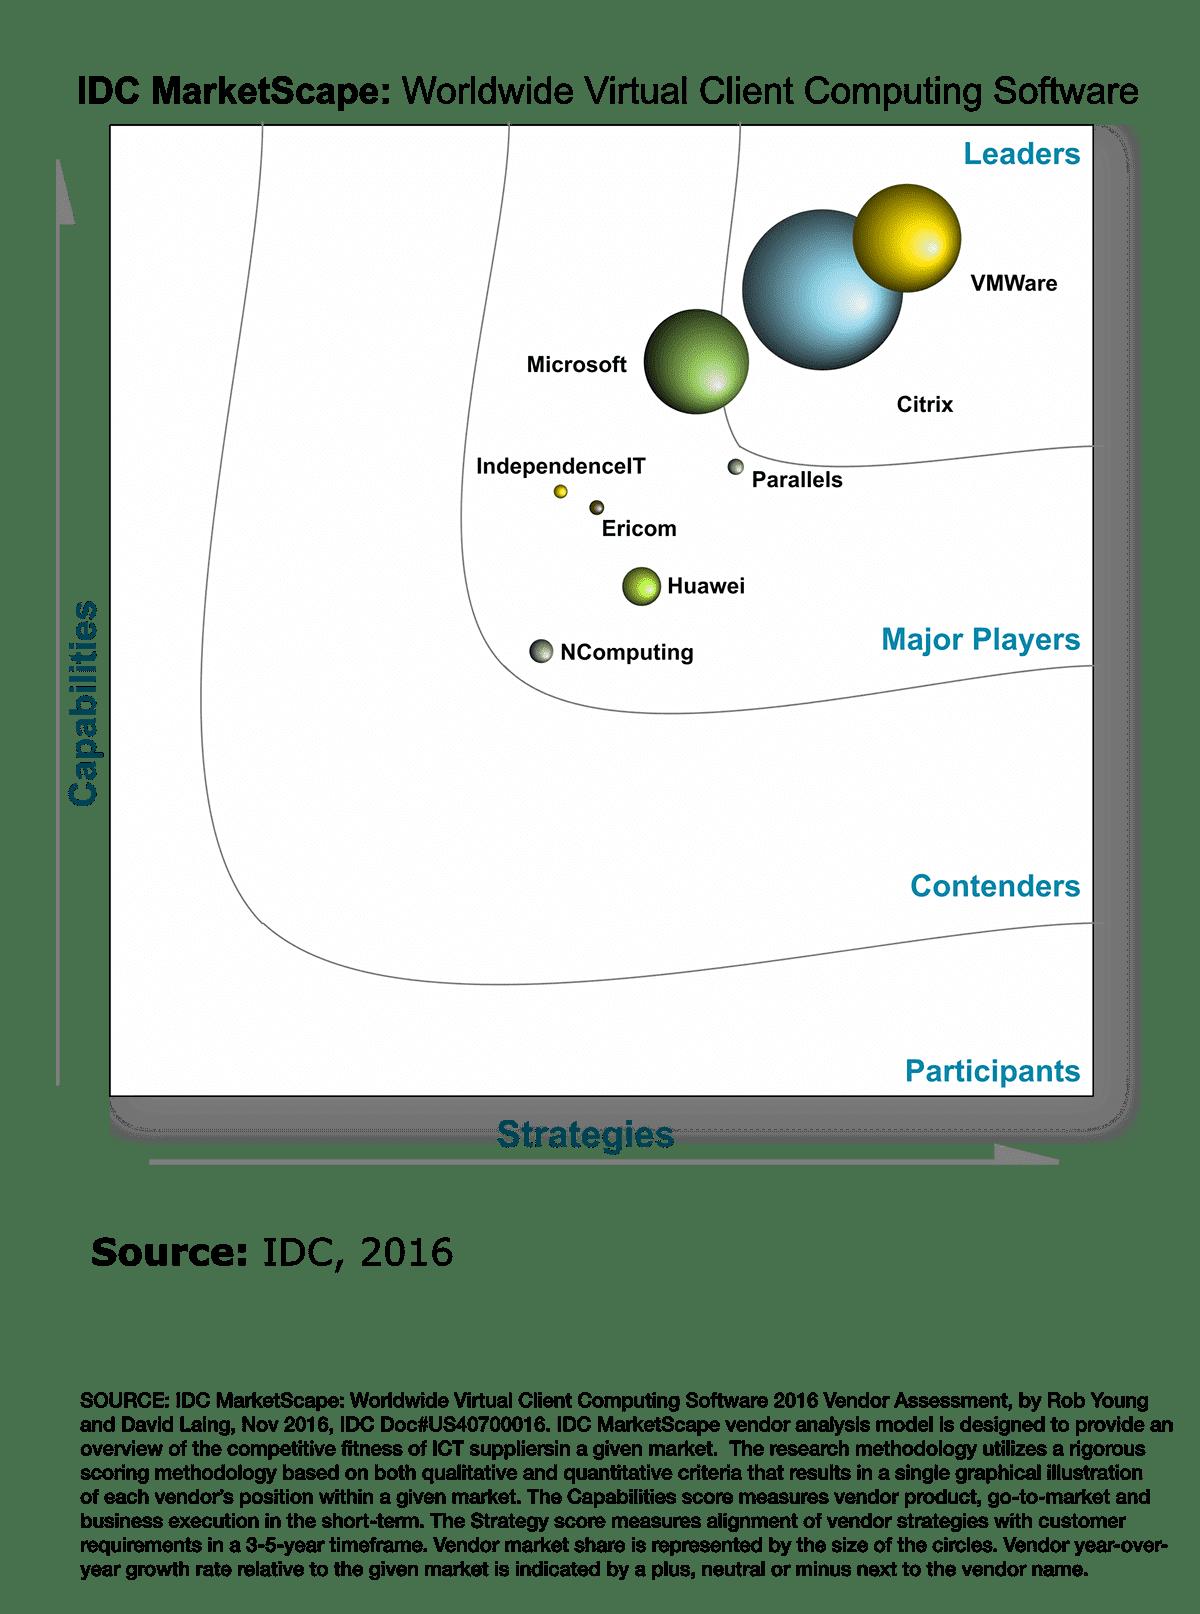 idc-scorecard-graphic-of-ww-virtual-client-computing-software-vendors